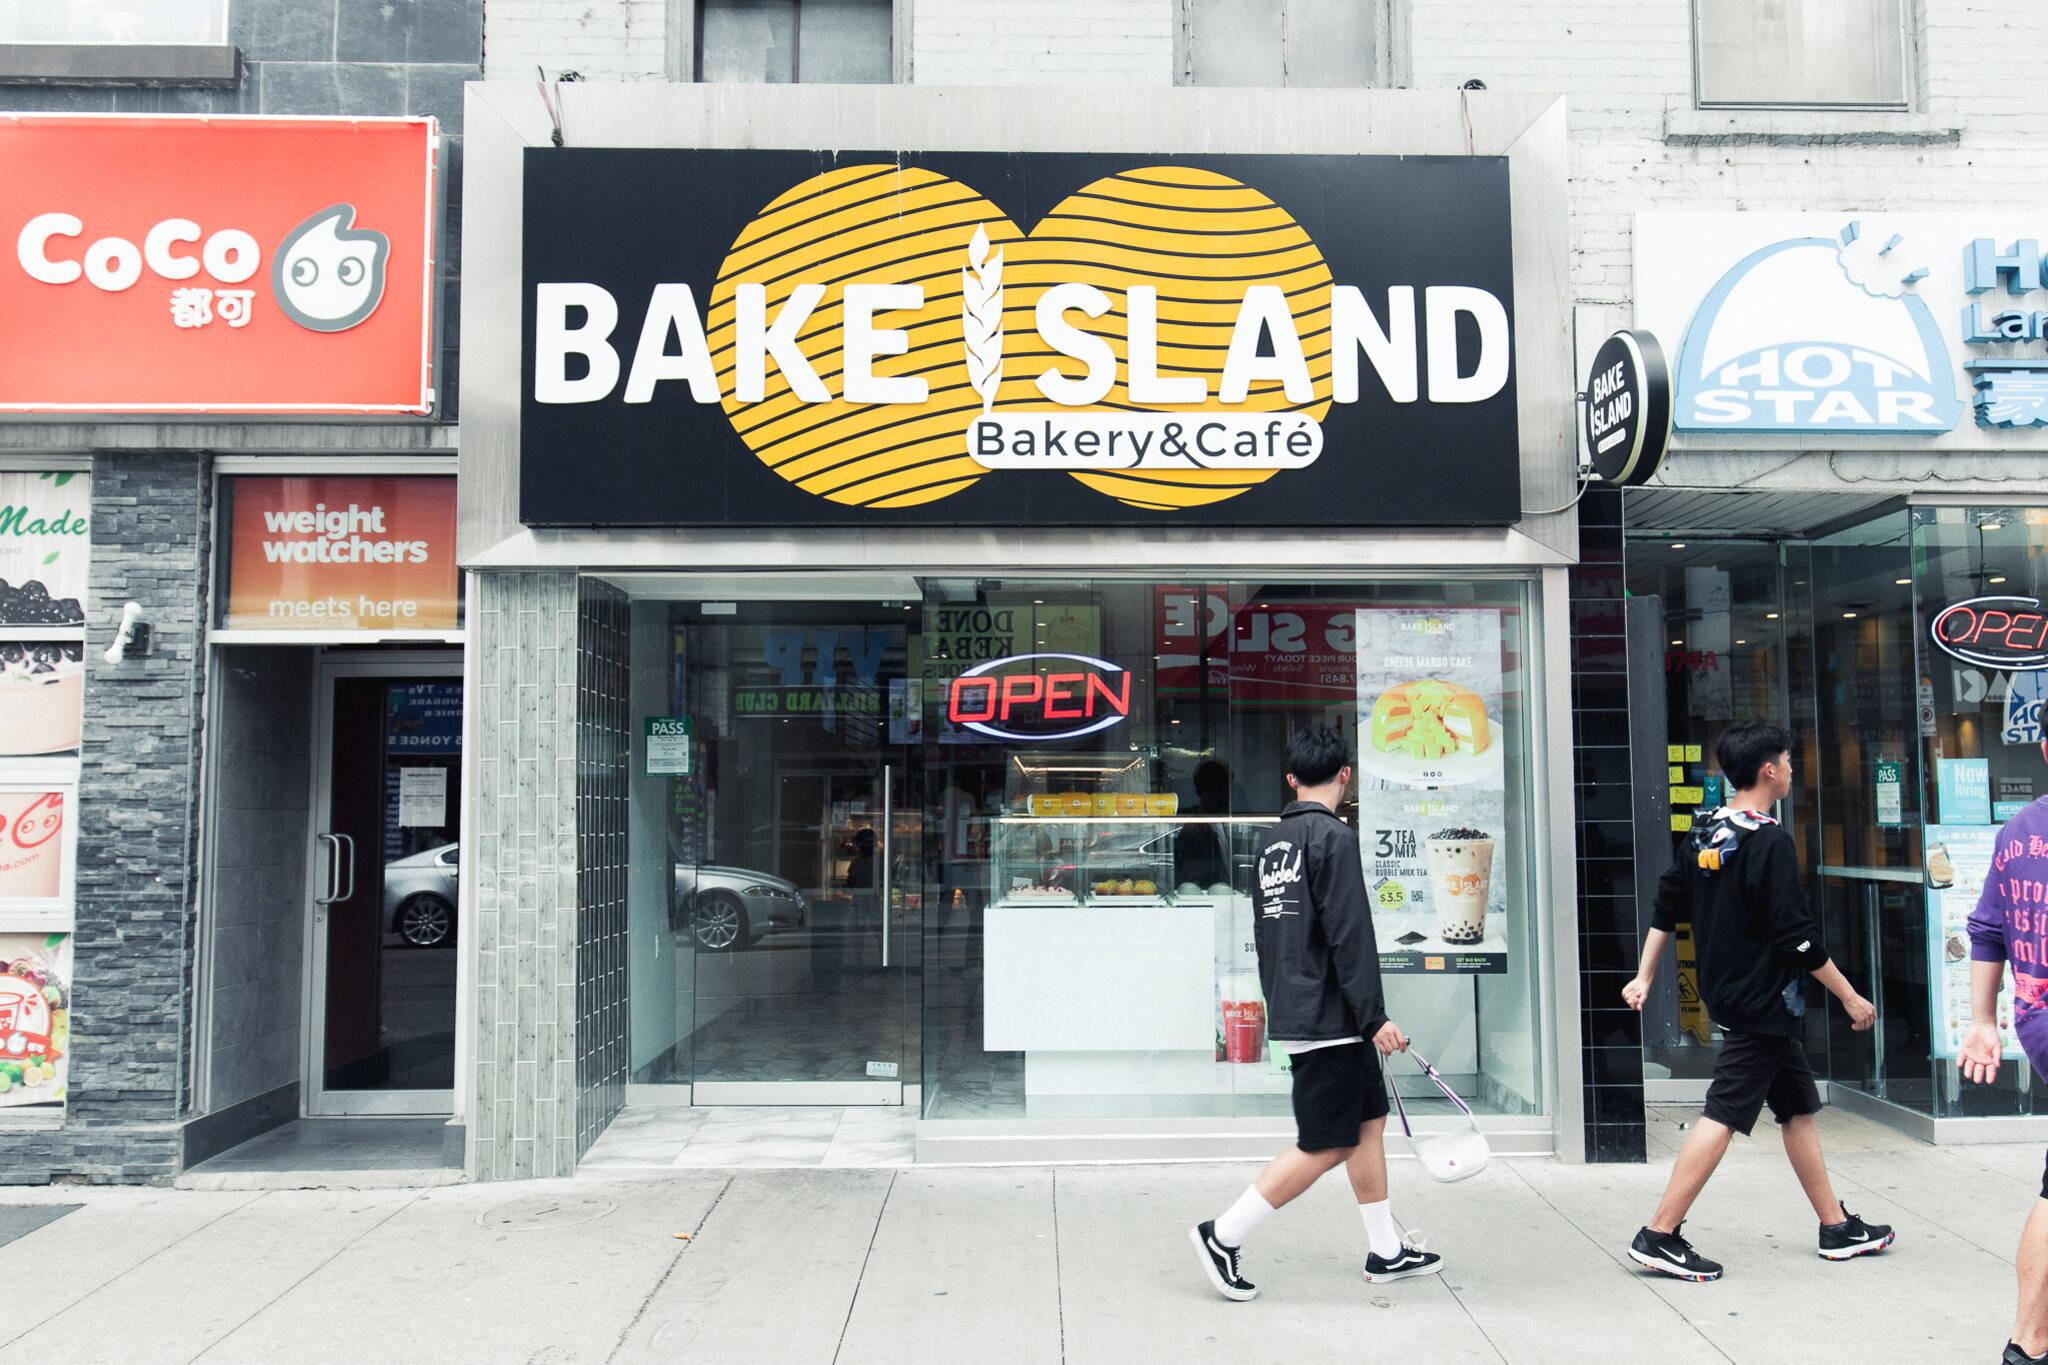 Bake Island Toronto